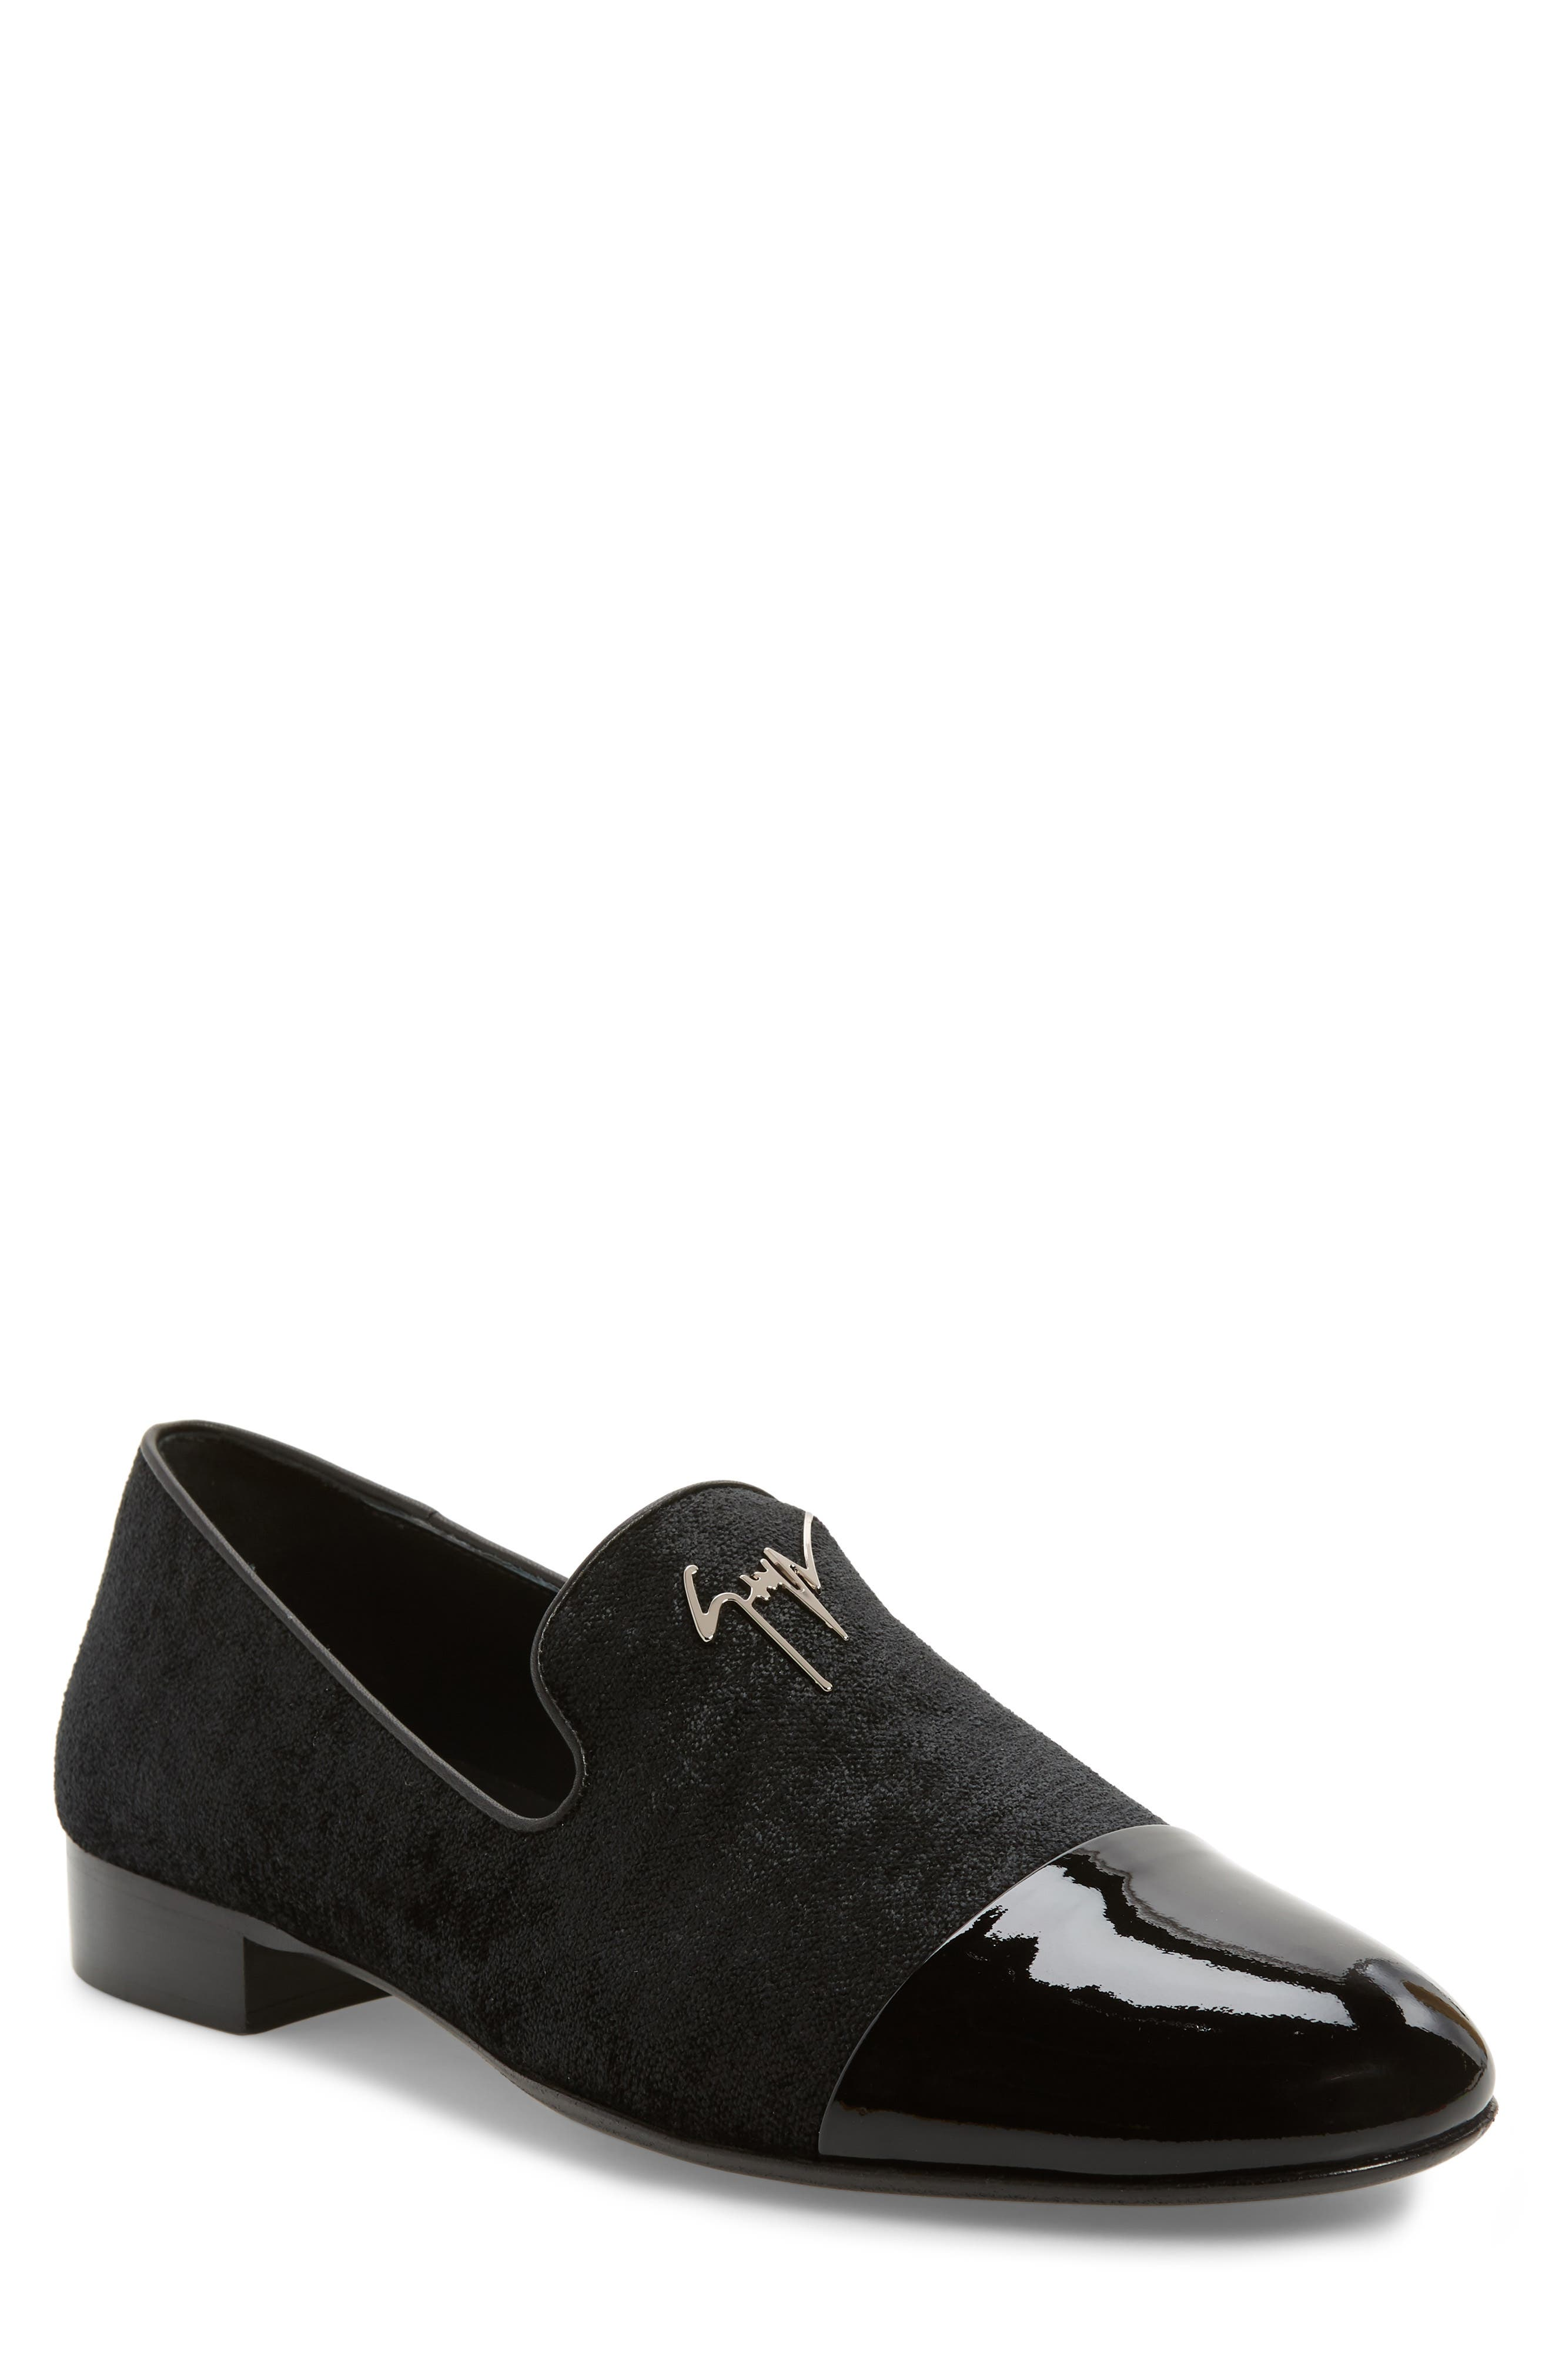 Tuxedo Loafer, Main, color, BLACK